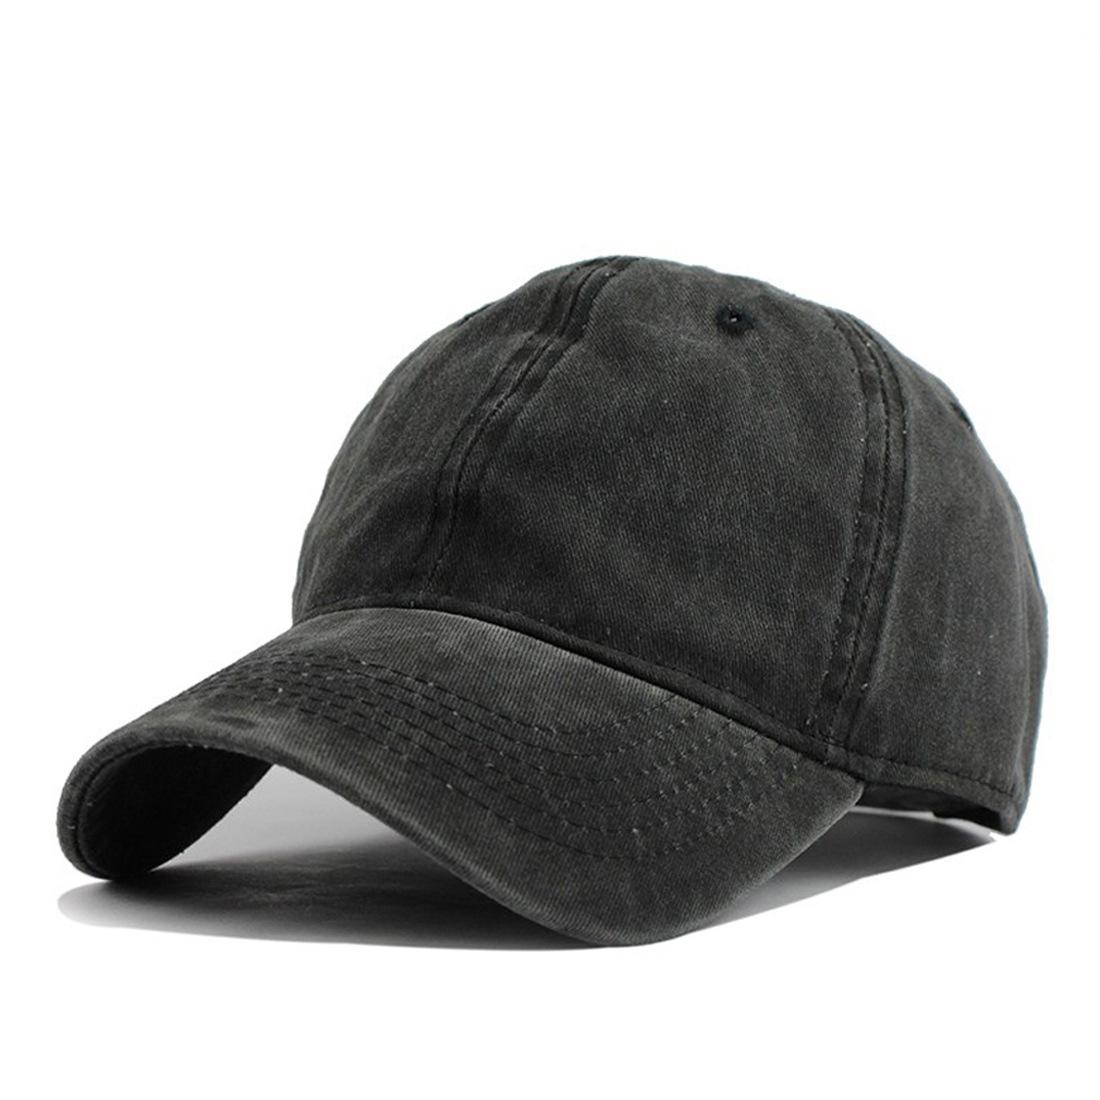 baecadf97 Mens Summer Adjustable Washed Denim Baseball Caps Outdoor Trucker Cap Dad  Hats